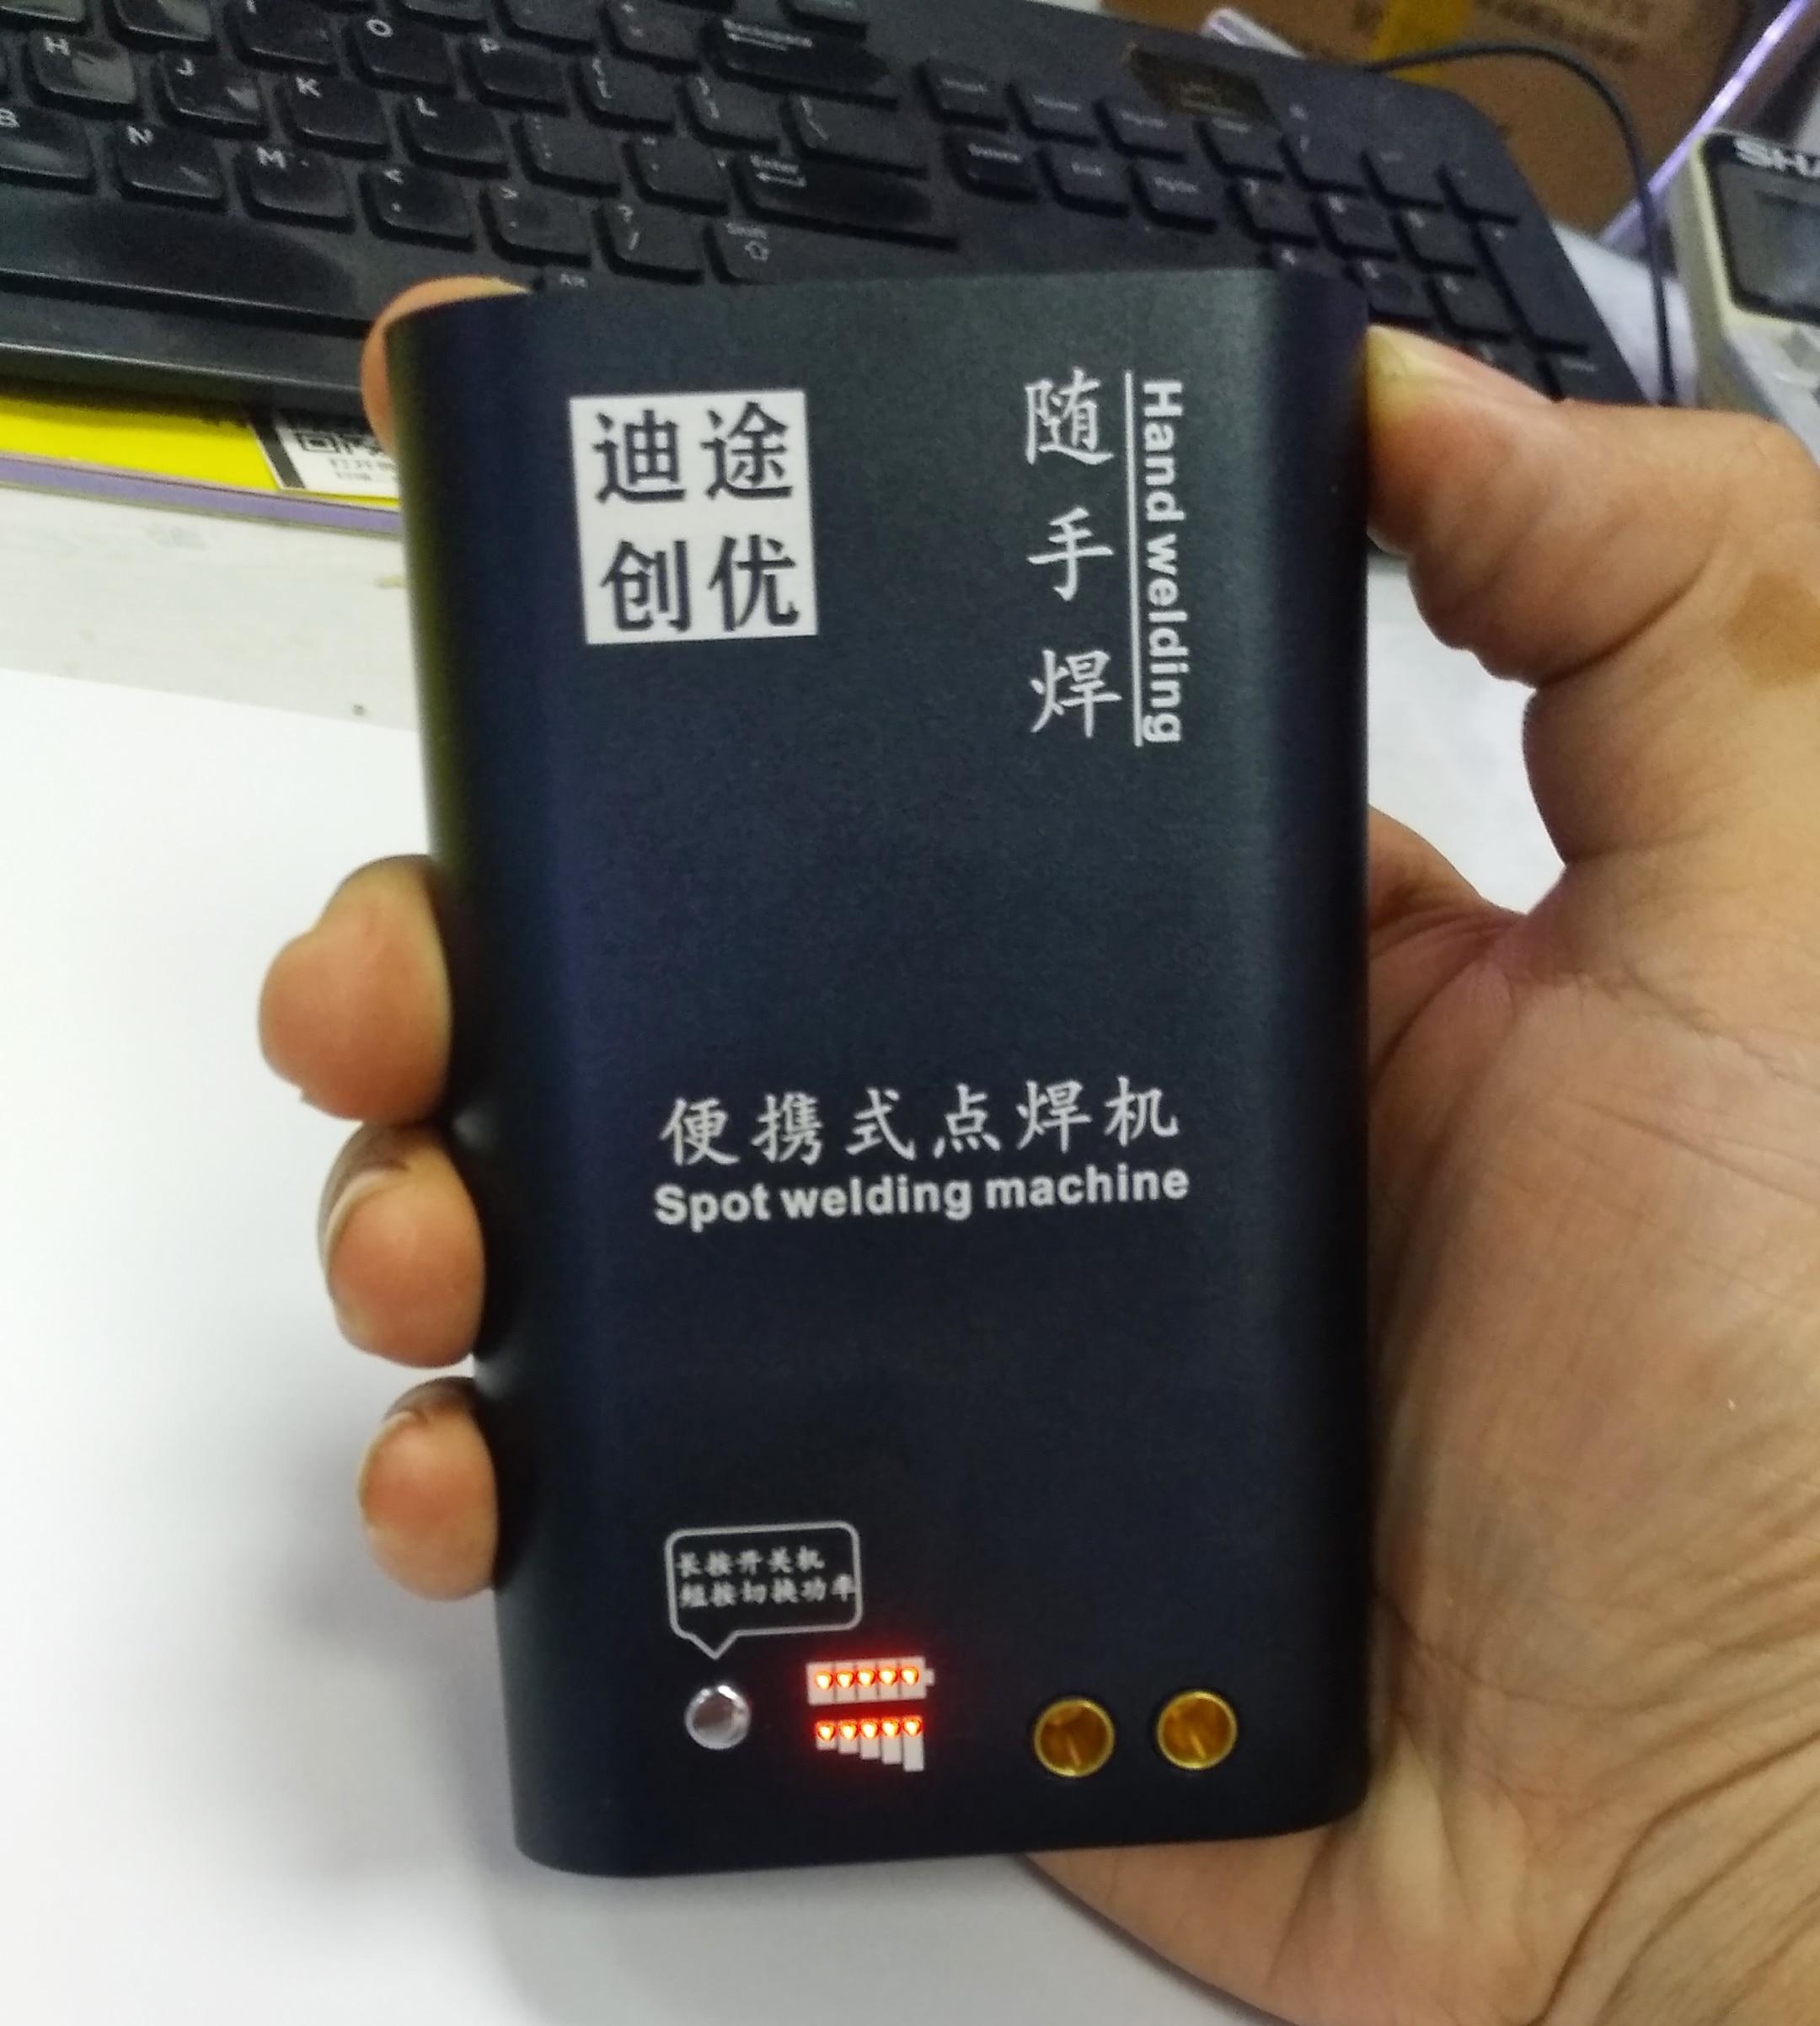 5V 2A 5000mA portable handheld small diy battery welder spot welding machine 18650 lithium battery repair nickel sheet kit enlarge